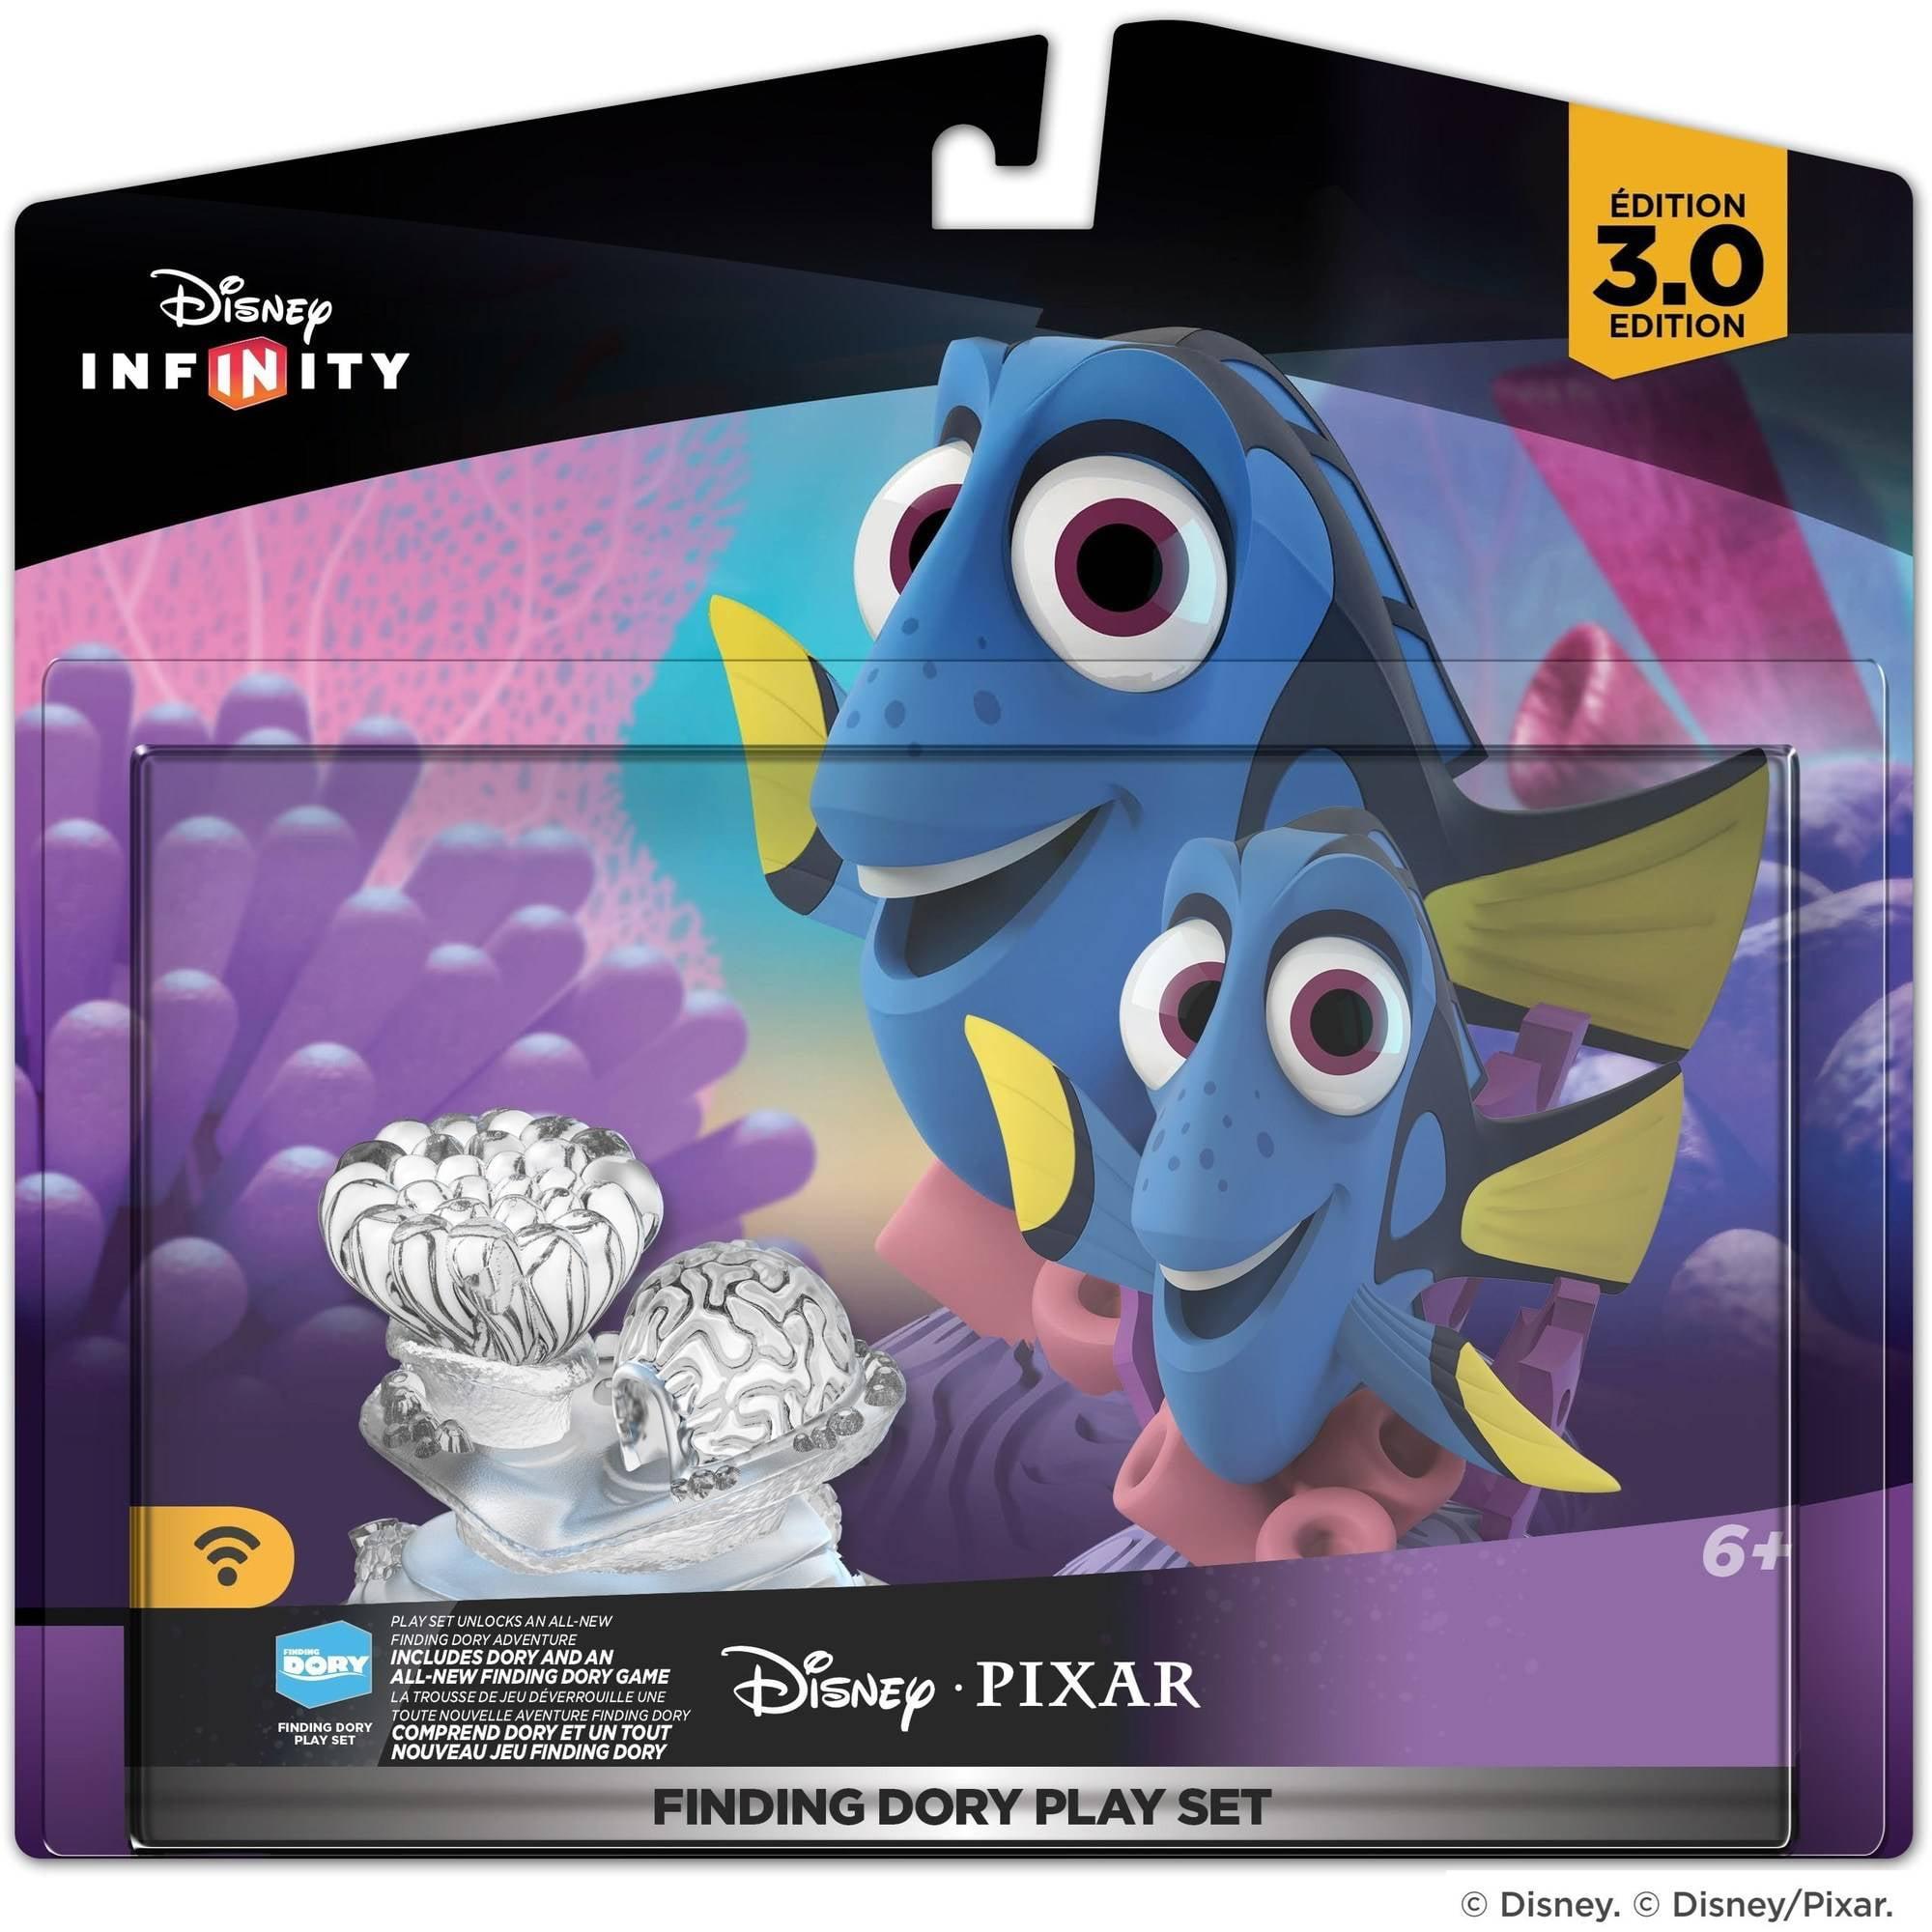 Disney Infinity 3.0 Disney*Pixar's Finding Dory Playset (Universal) by Disney